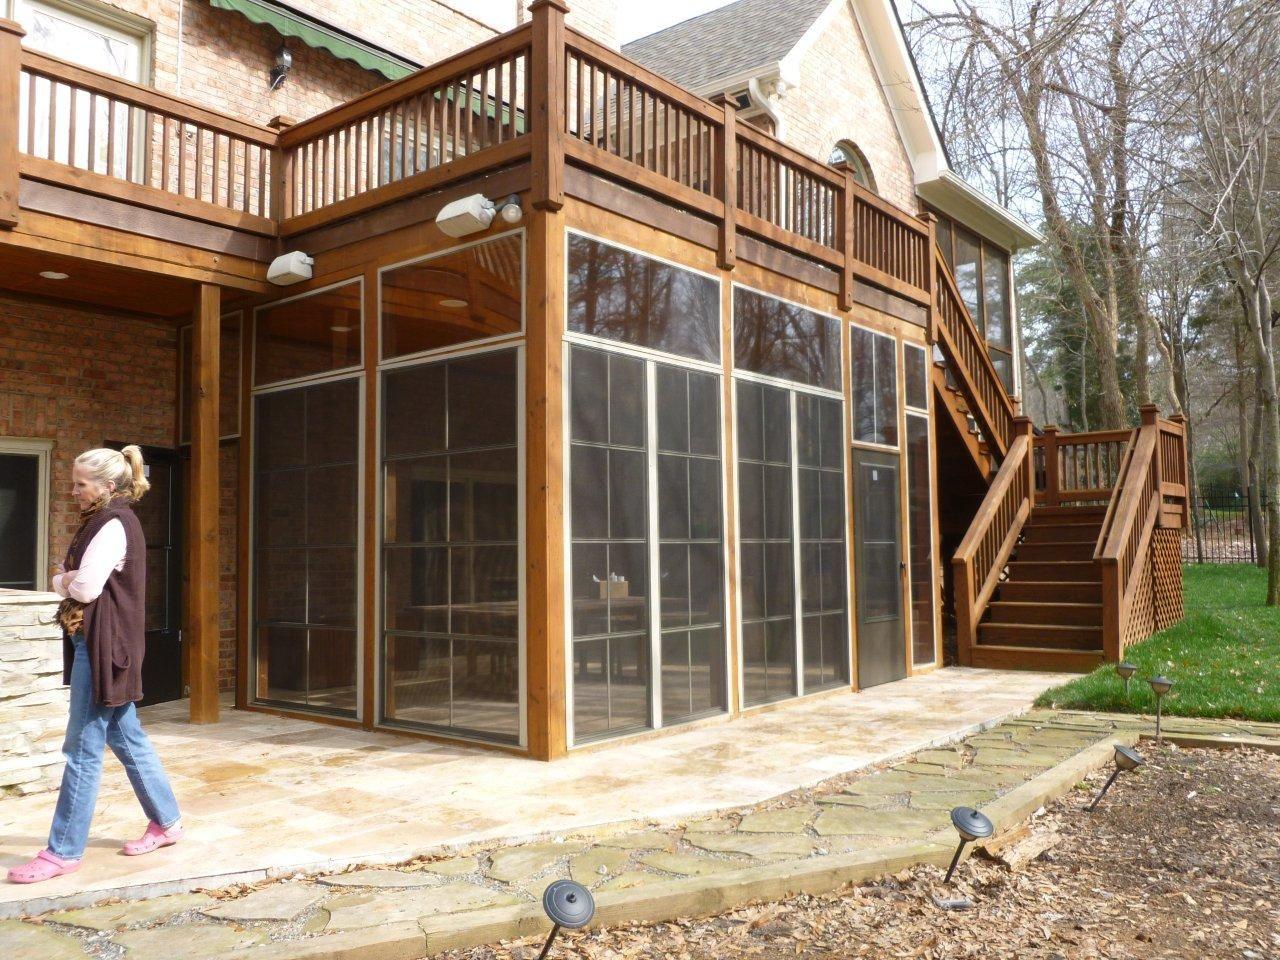 Innovative Myers Park Screened Porch Travertine patio